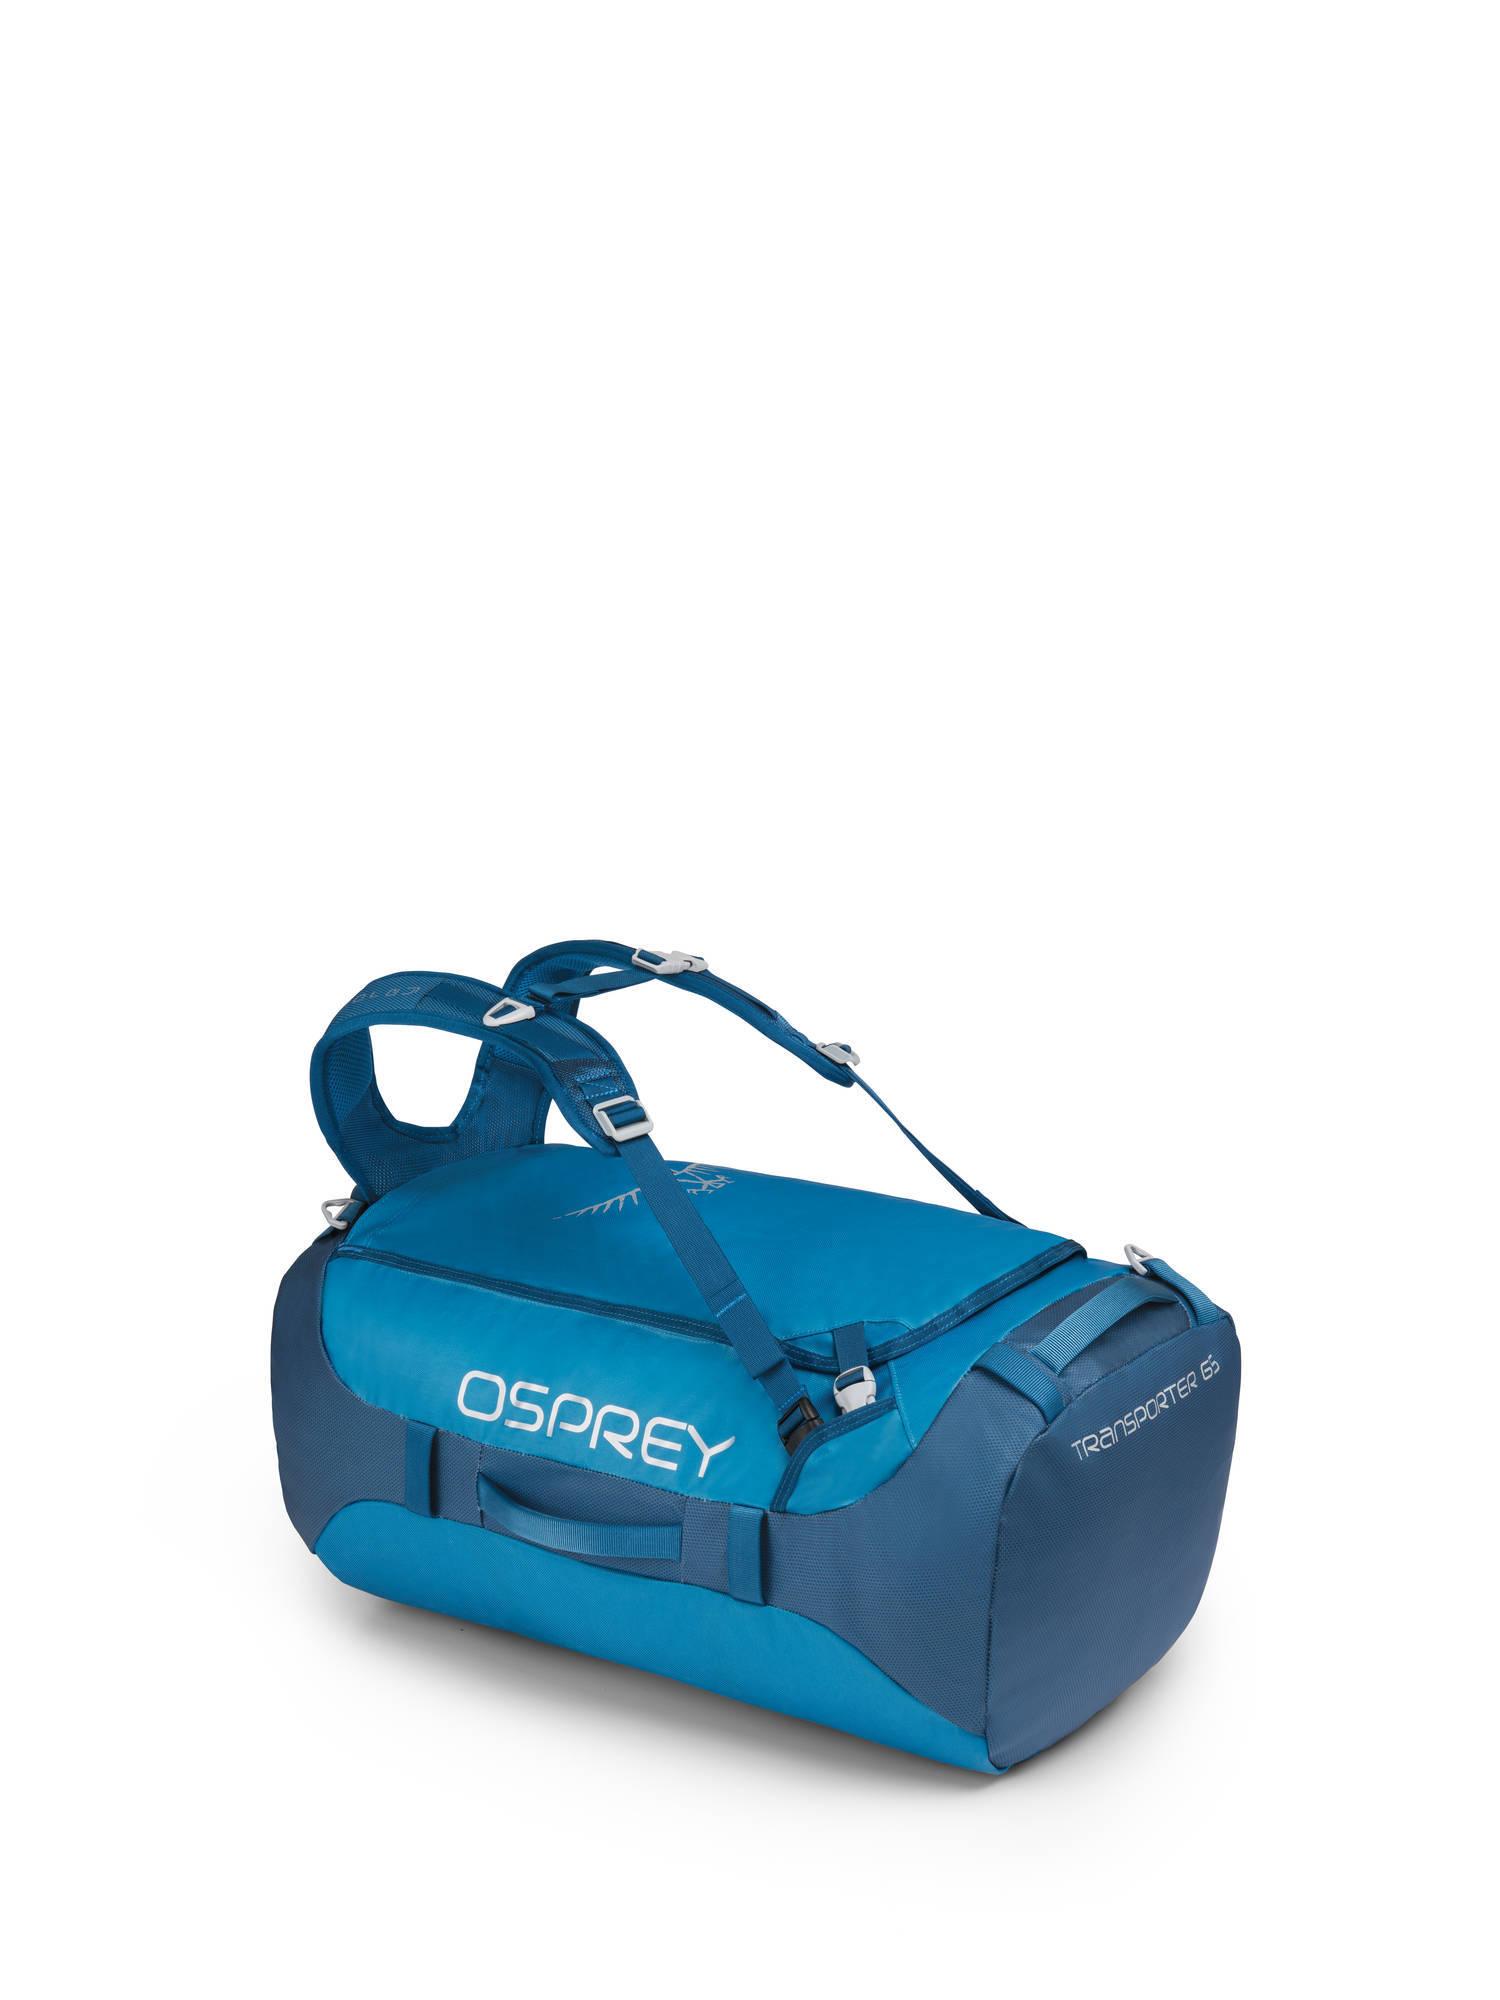 Сумки-рюкзаки Сумка-рюкзак Osprey Transporter 65 Kingfisher Blue Transporter_65_F17_Side2_Kingfisher_Blue_web.jpg